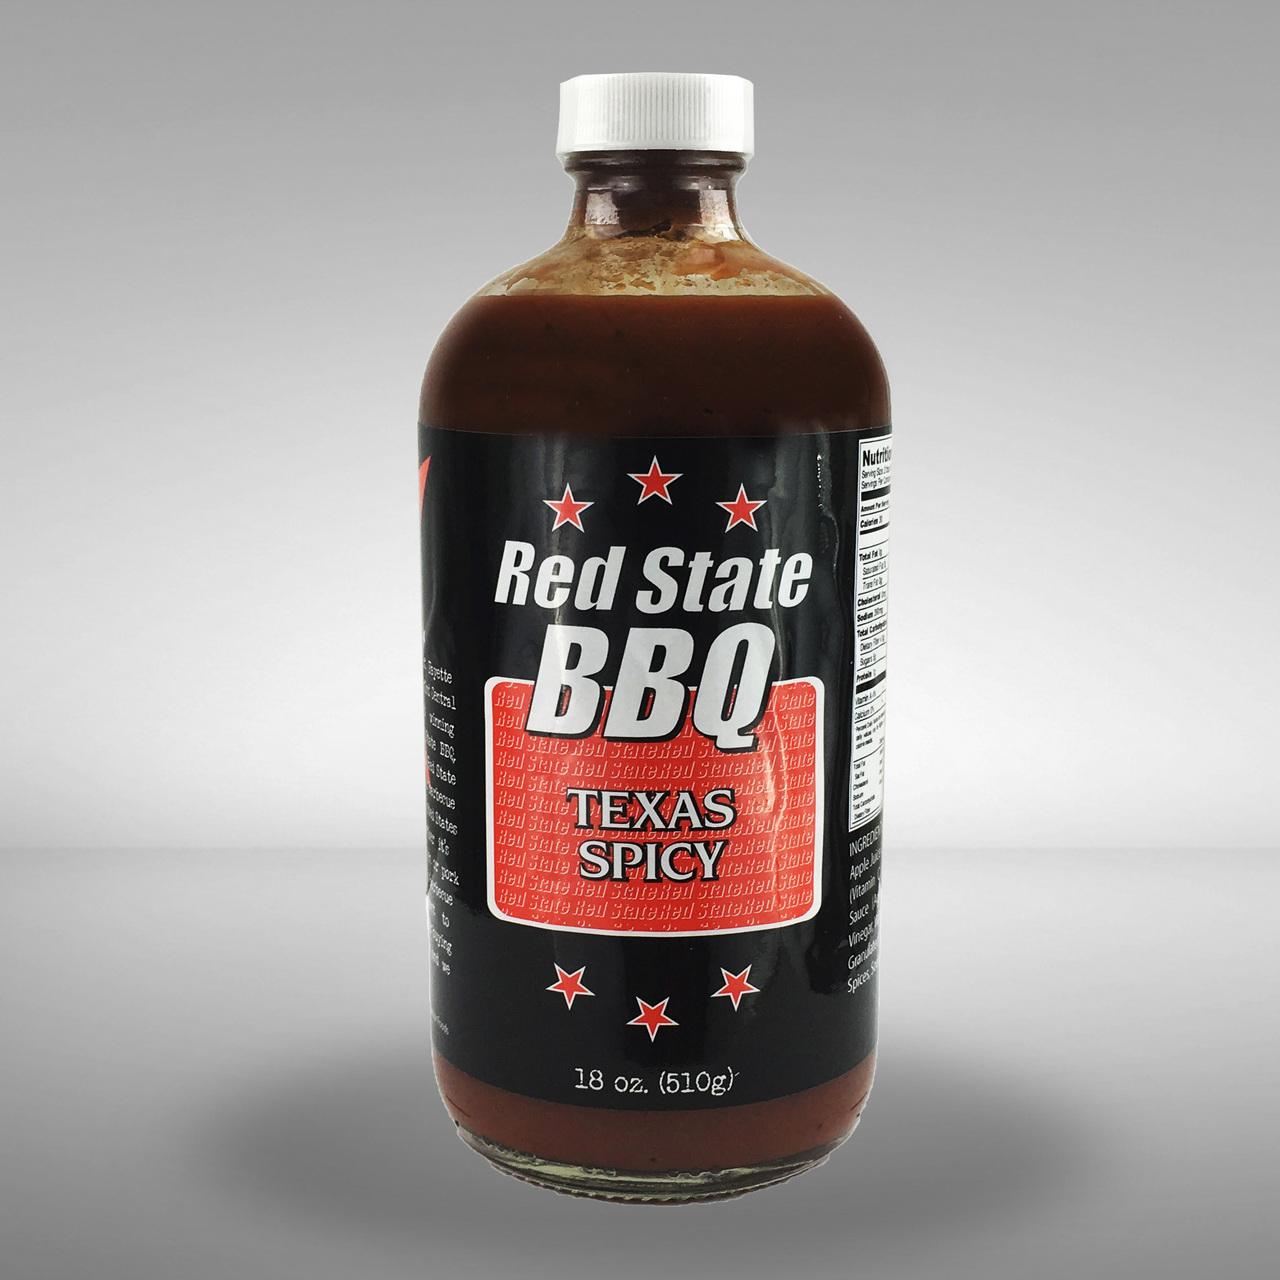 Texas Spicy